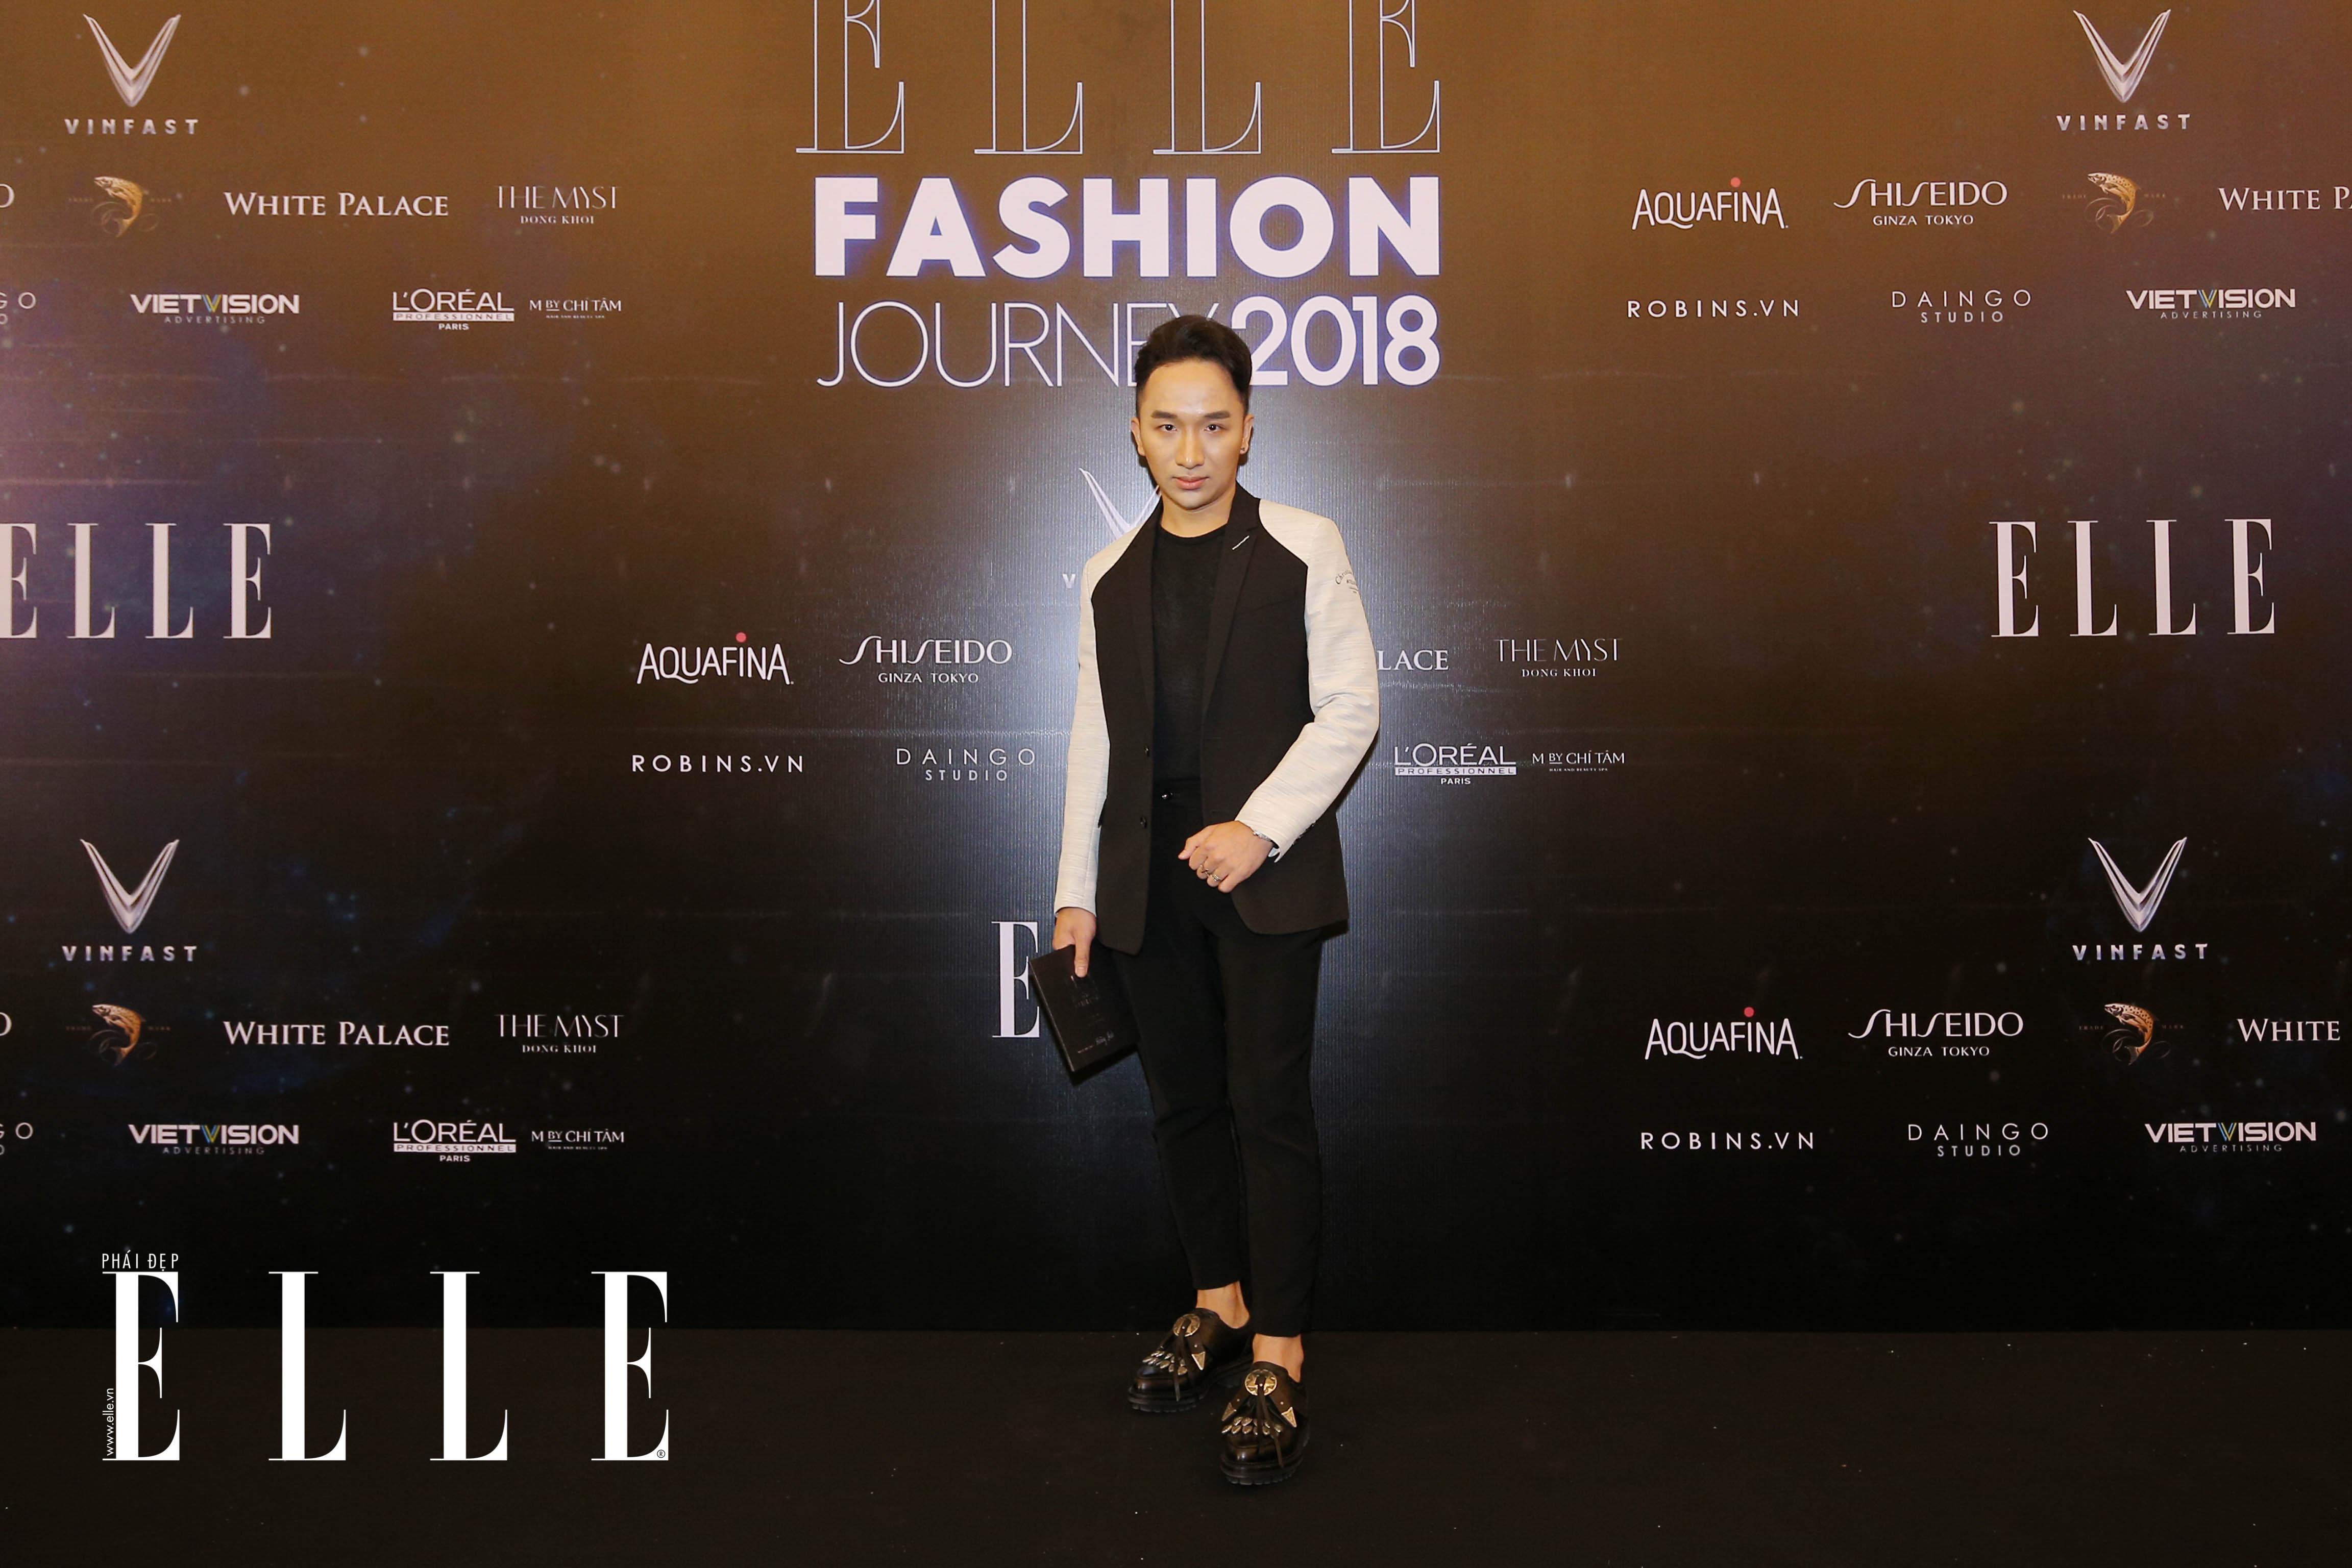 ELLE Fashion Journey tham do 29